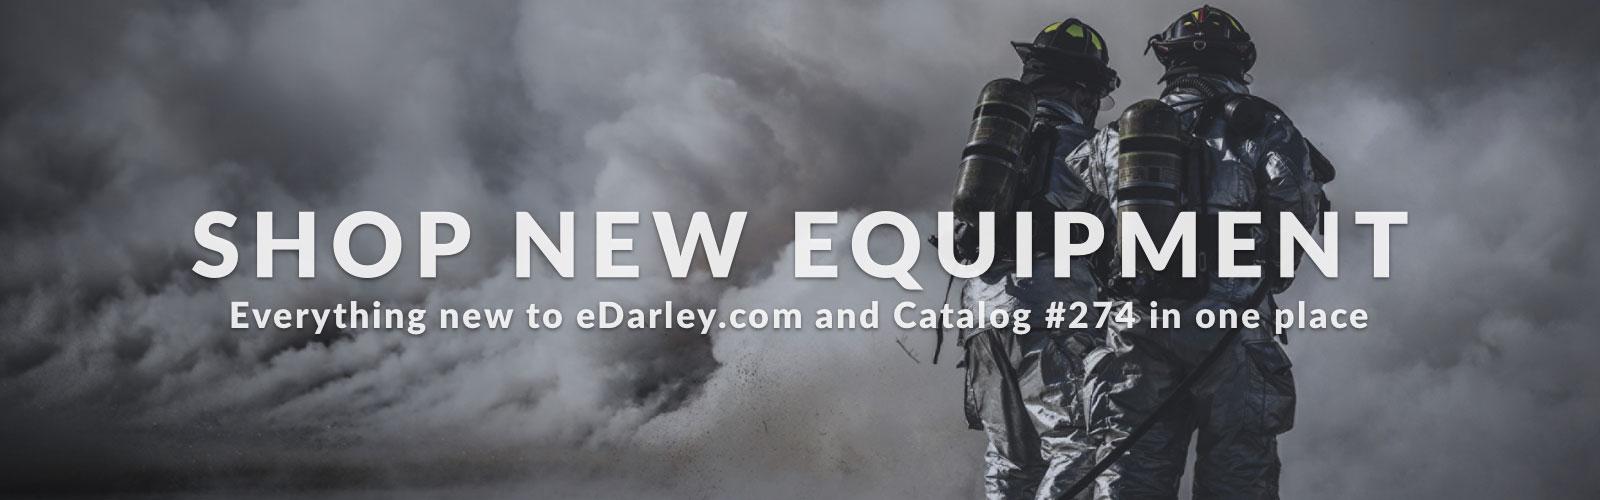 New Equipment Banner